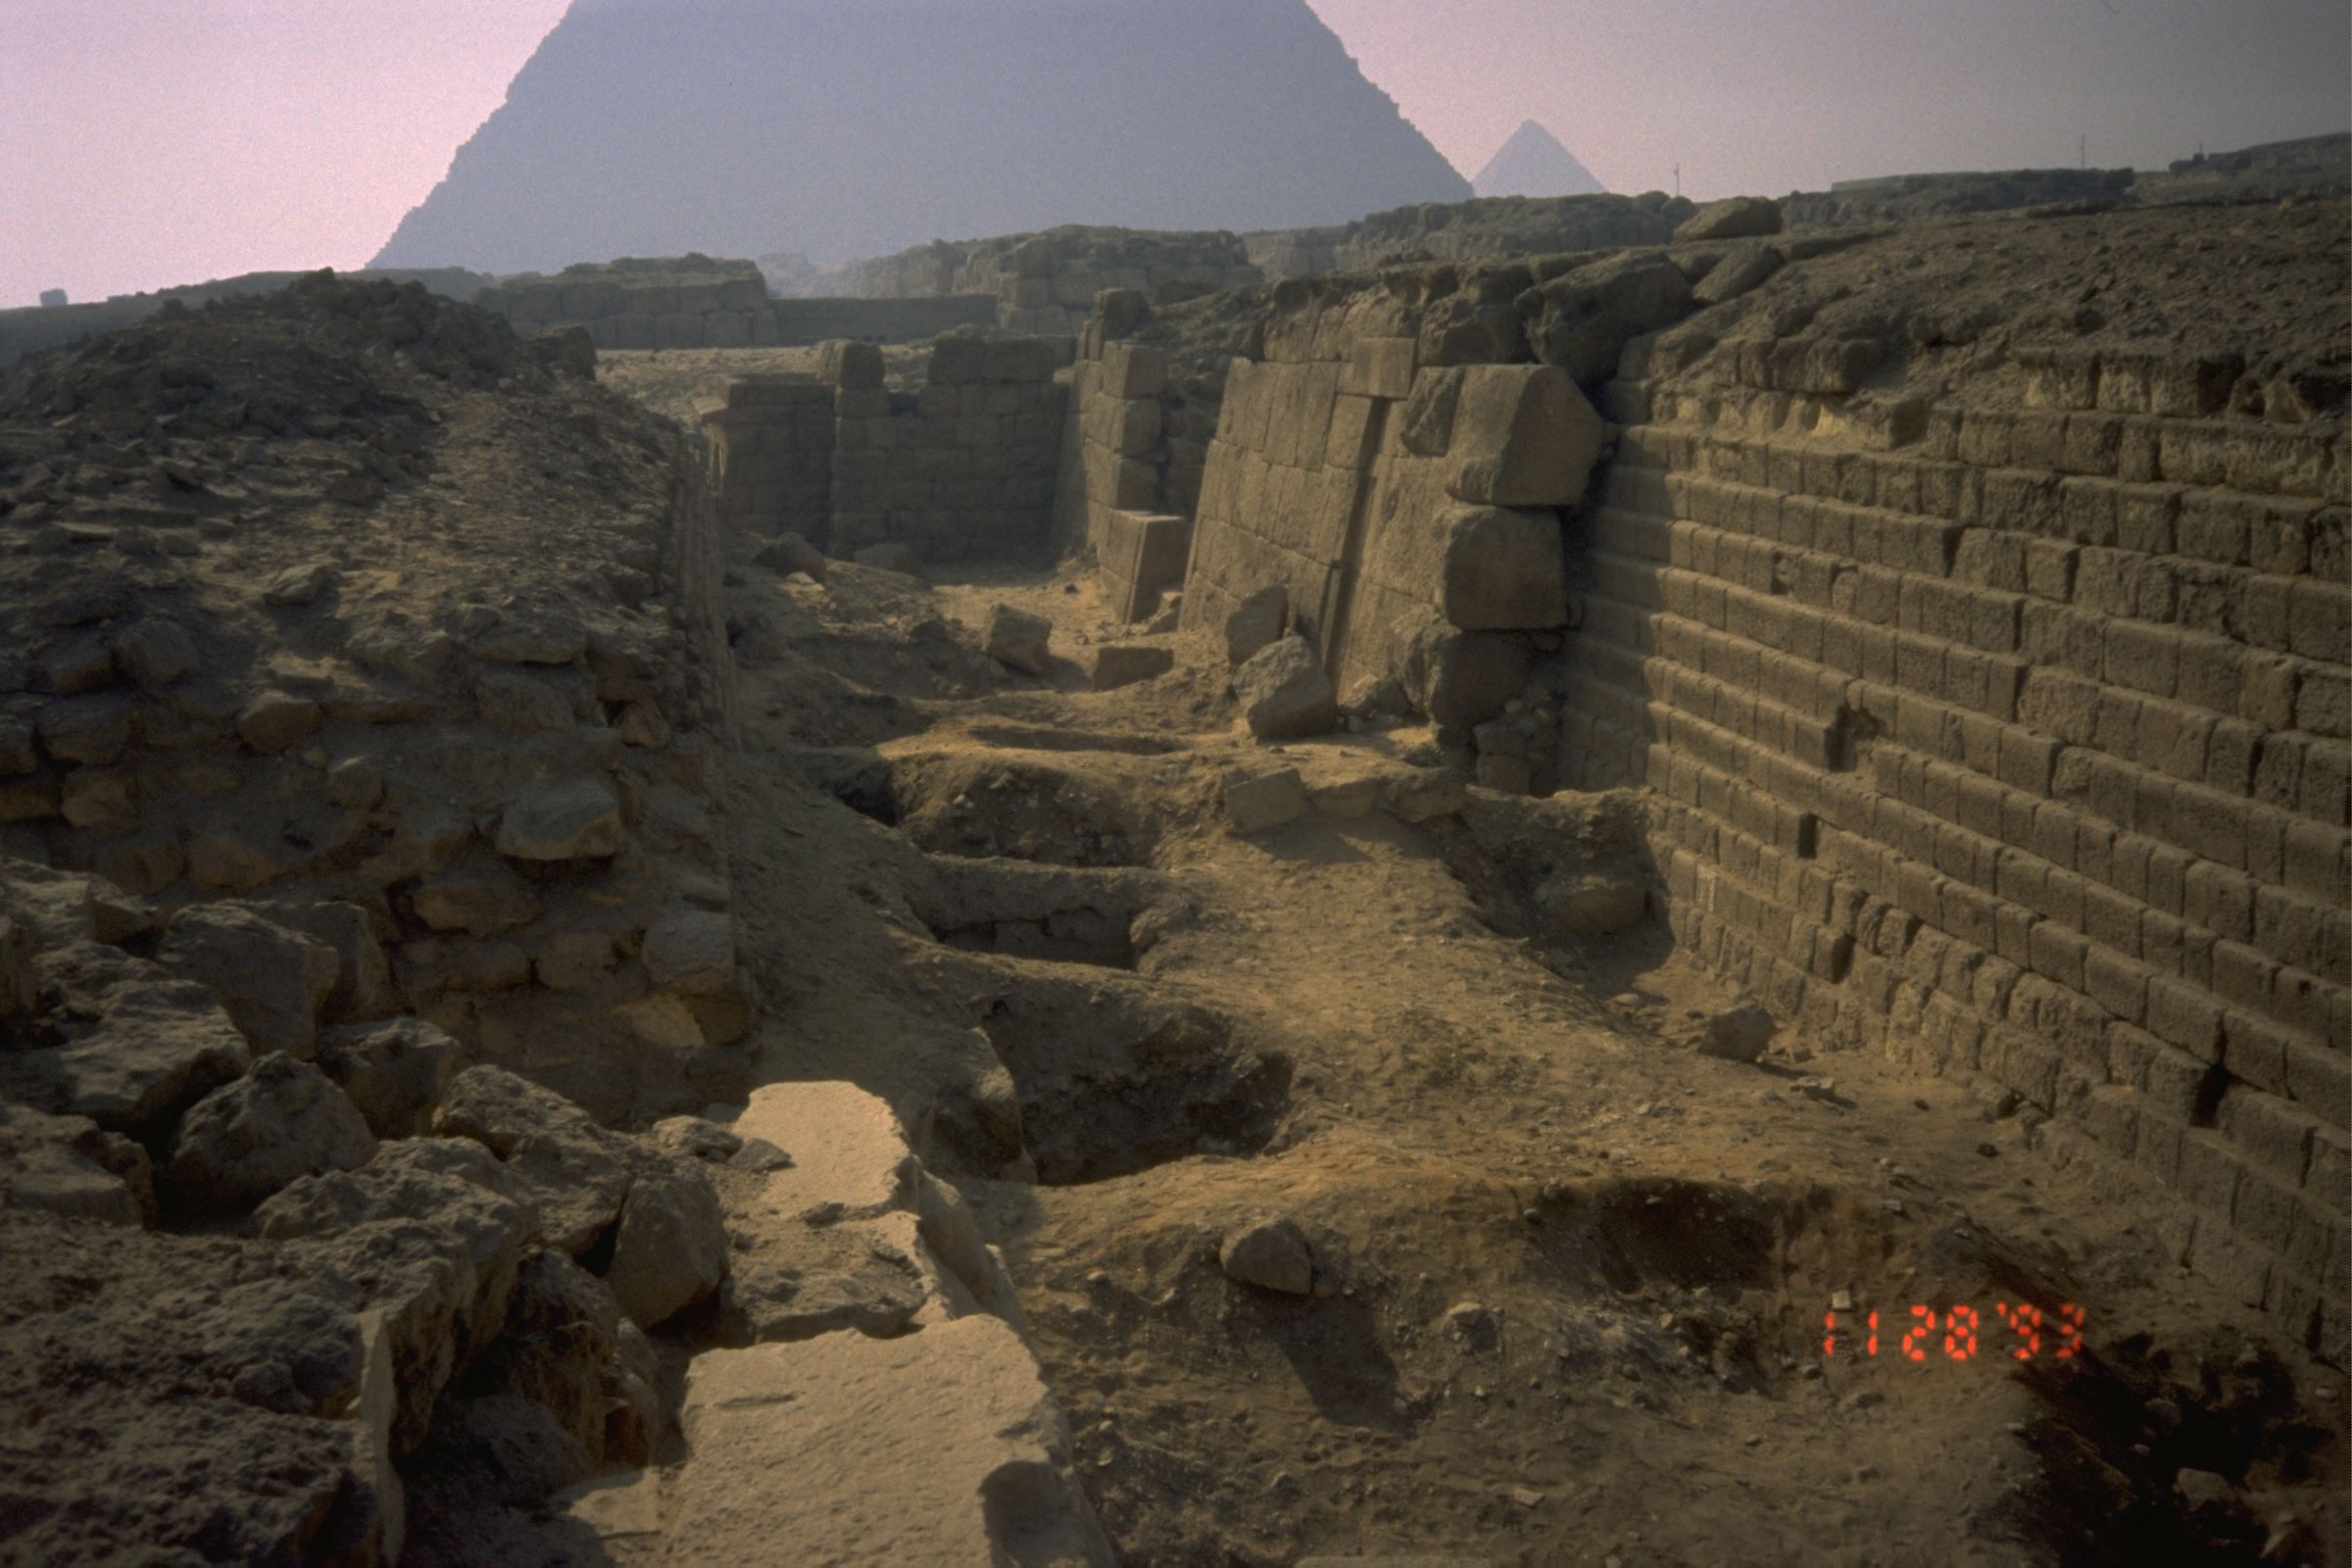 Western Cemetery: Site: Giza; View: G 2100-I, G 2100, G 2102, G 2103, G 2104, G 2105